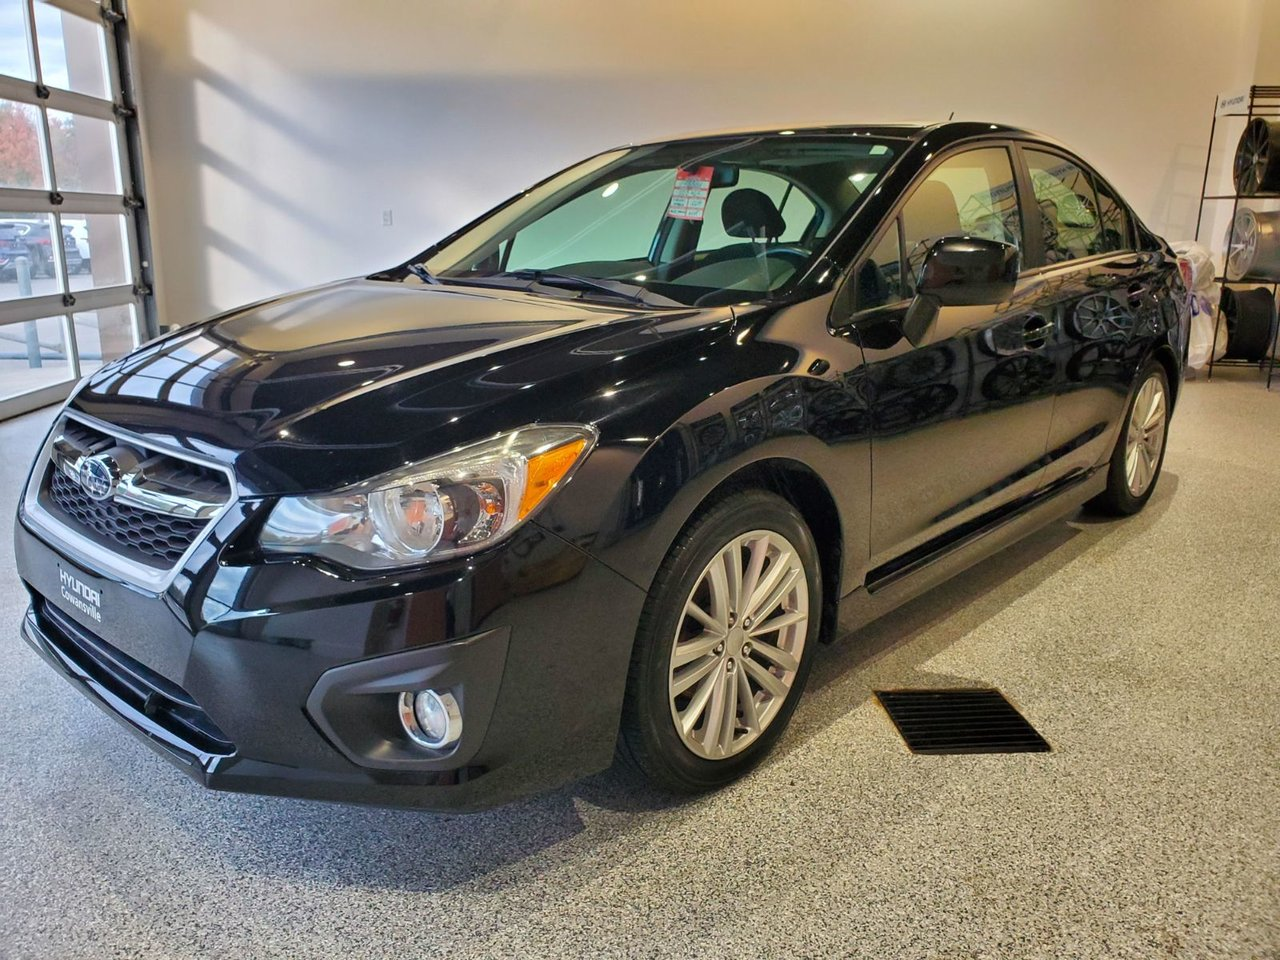 2014 Subaru  Impreza Sedan AWD - SIÈGES CHAUFFANTS - TOIT OUVRANT - MAGS